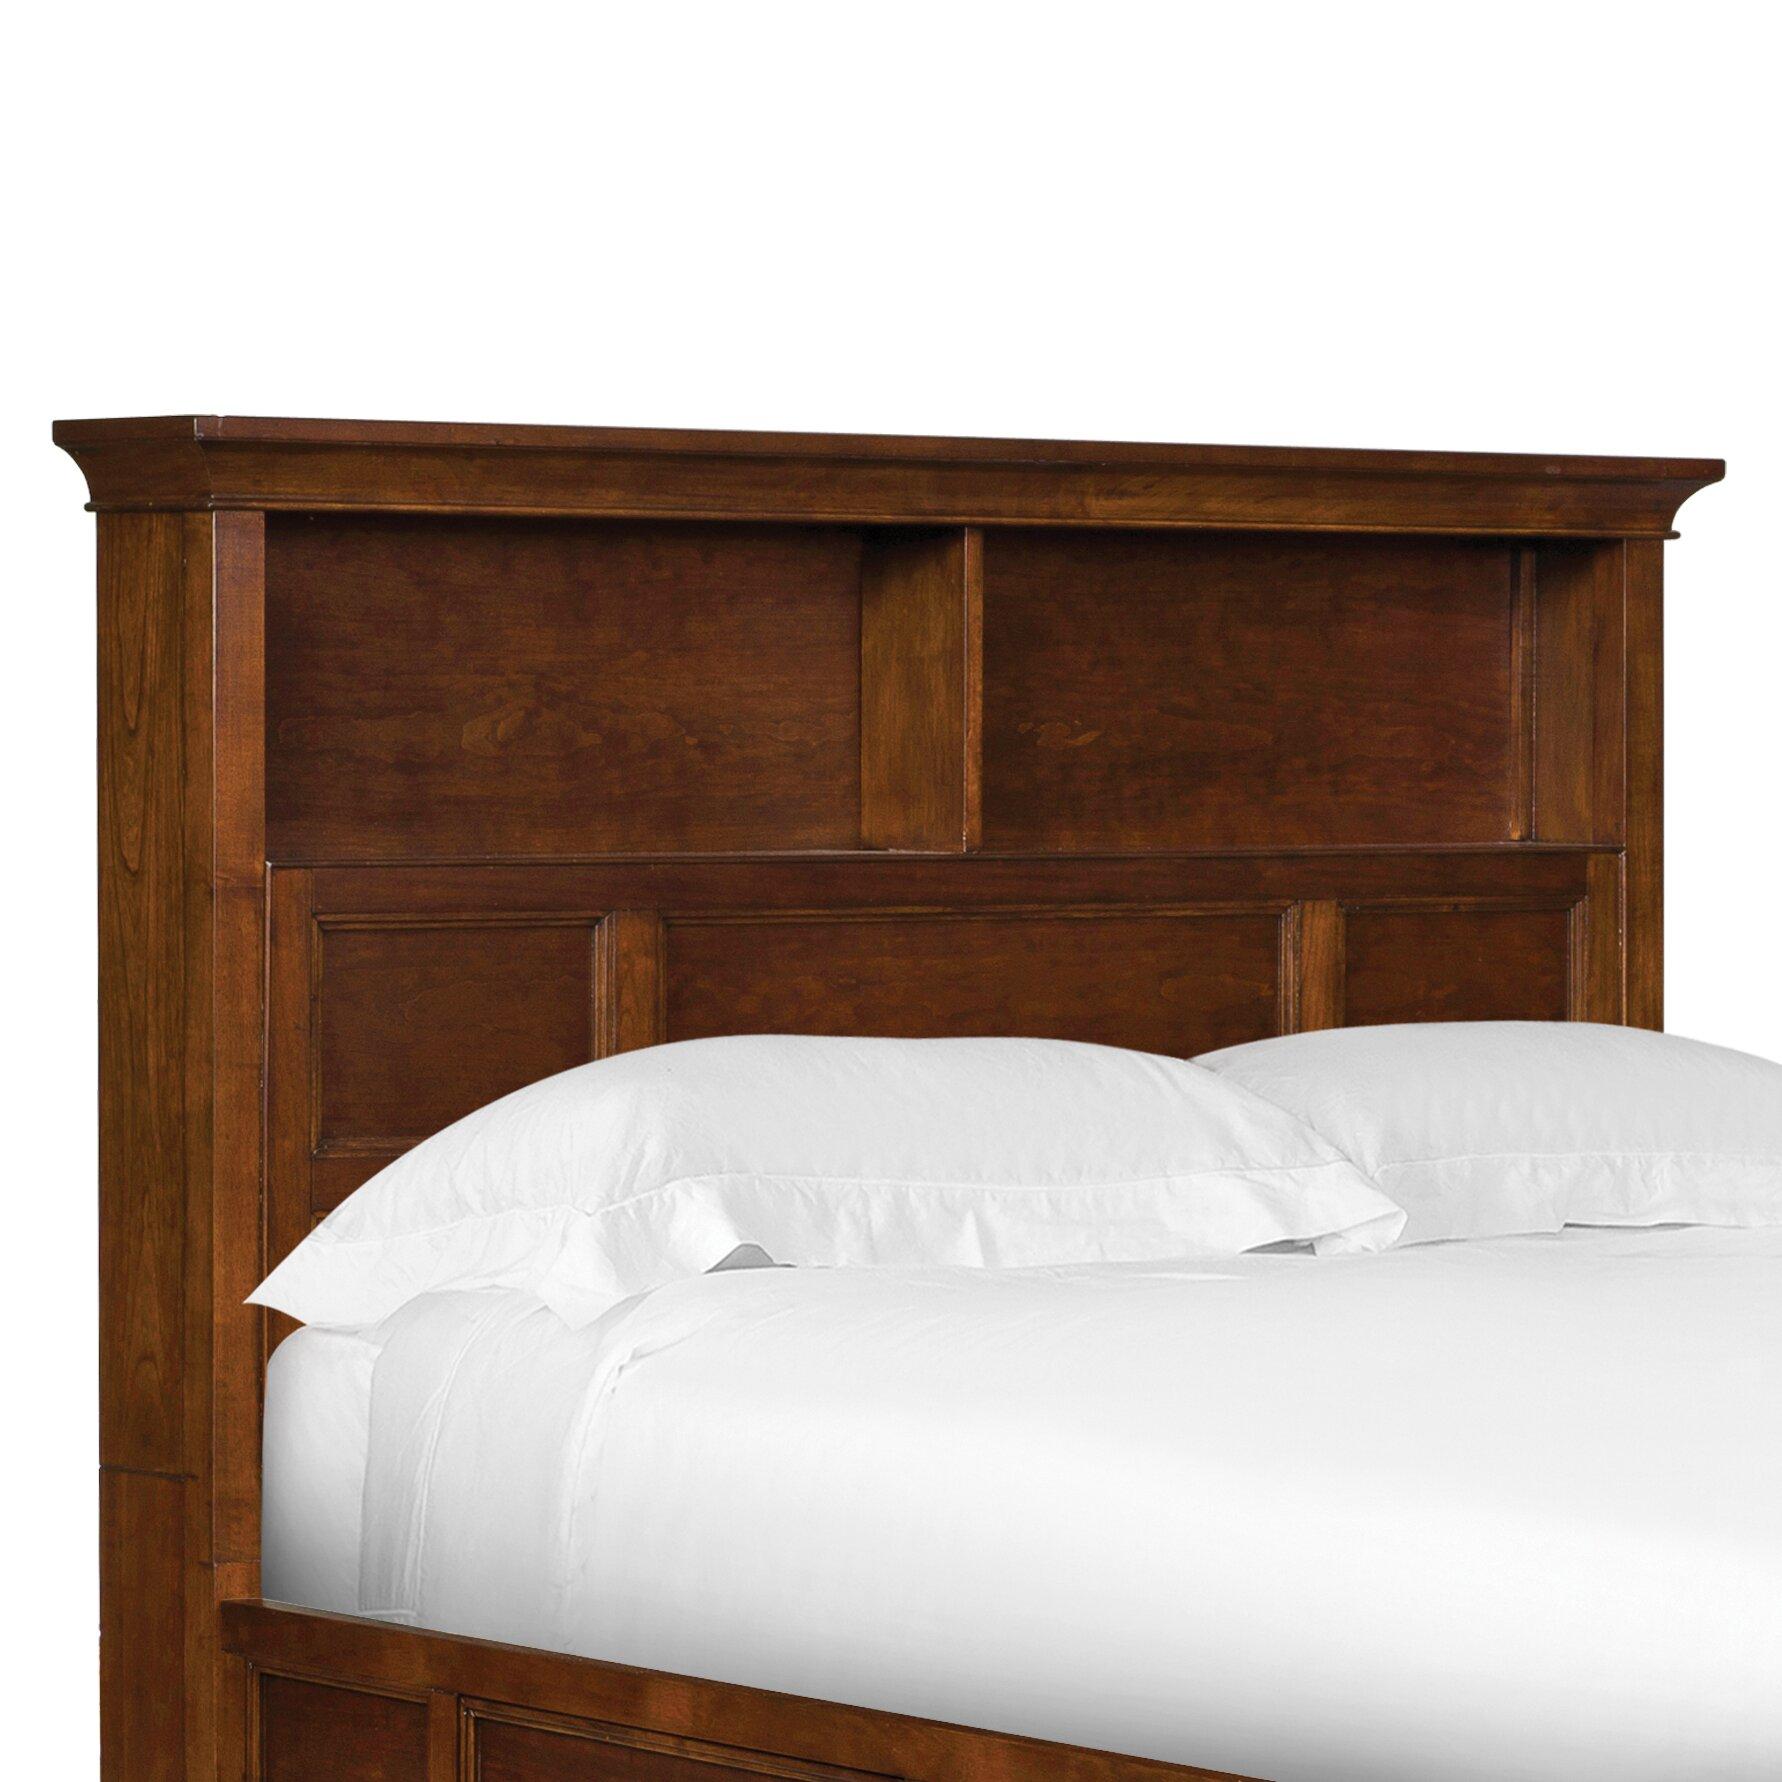 Darby home co diana platform customizable bedroom set for Diana bedroom set